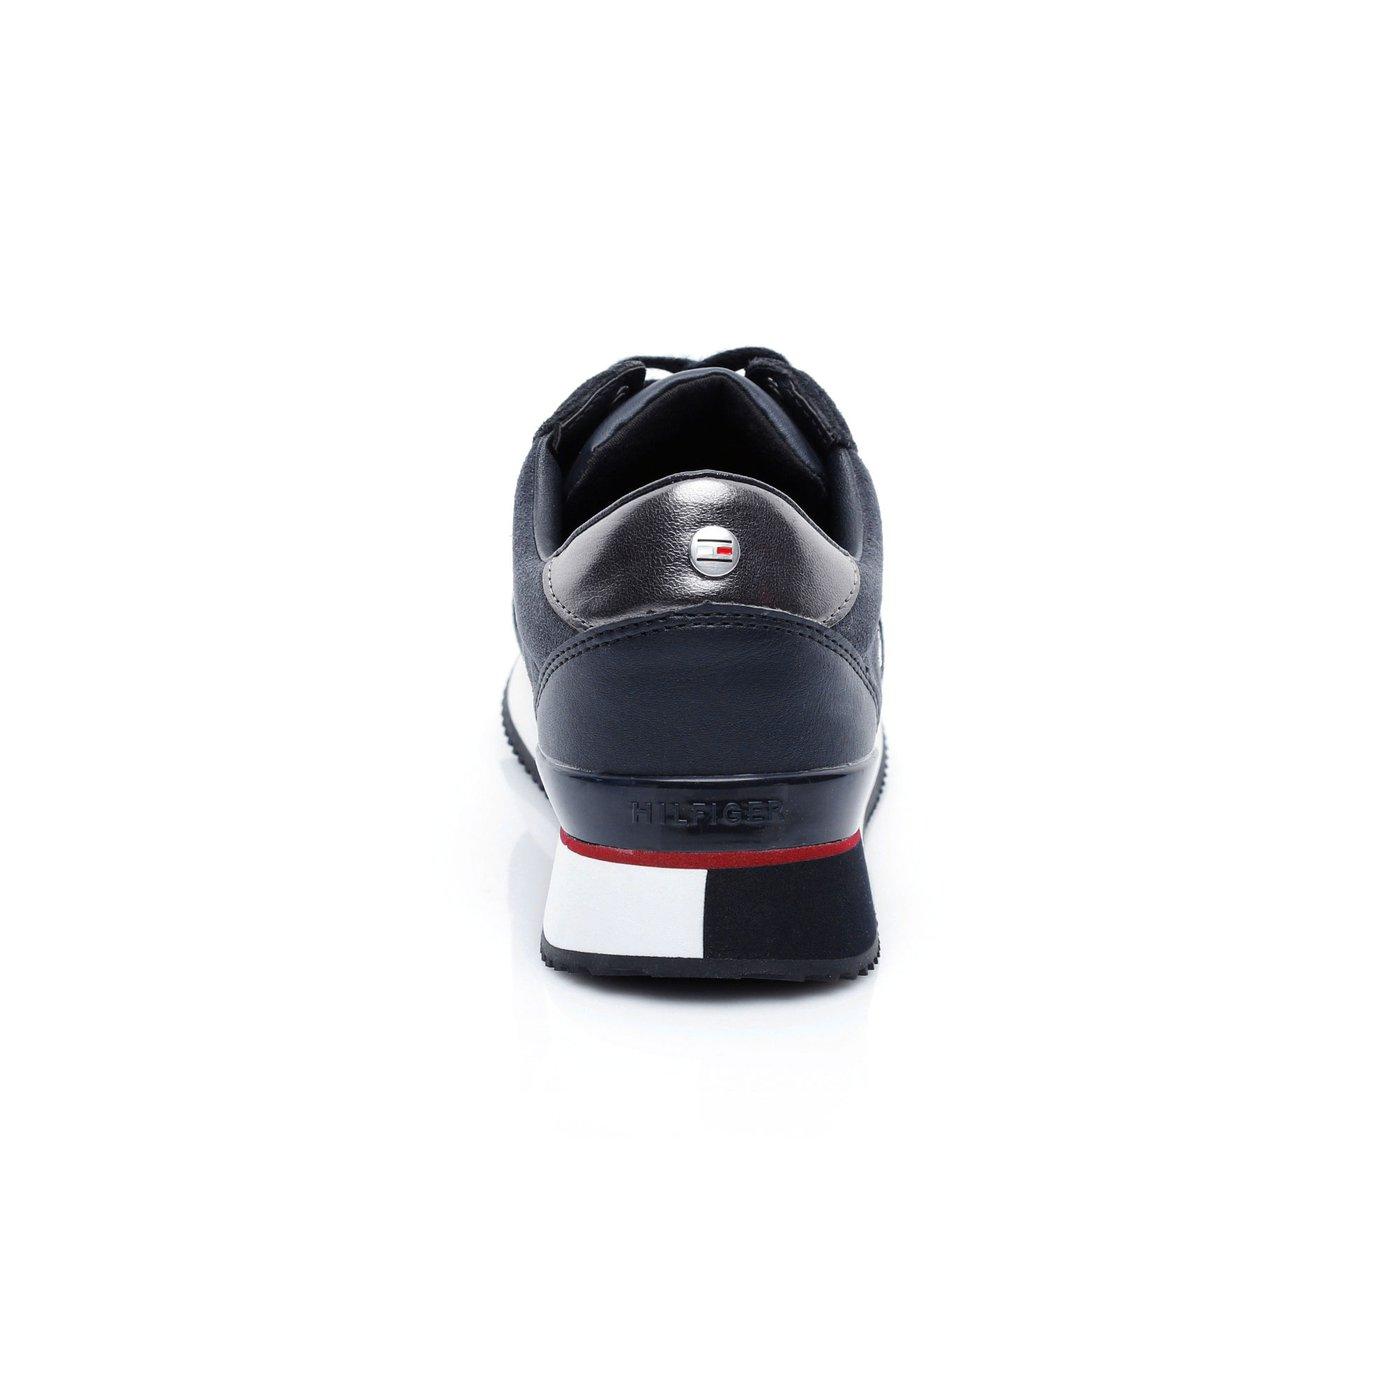 Tommy Hilfiger Stud City Kadın Lacivert Sneaker Kadin Sneaker ... da0ad8531f